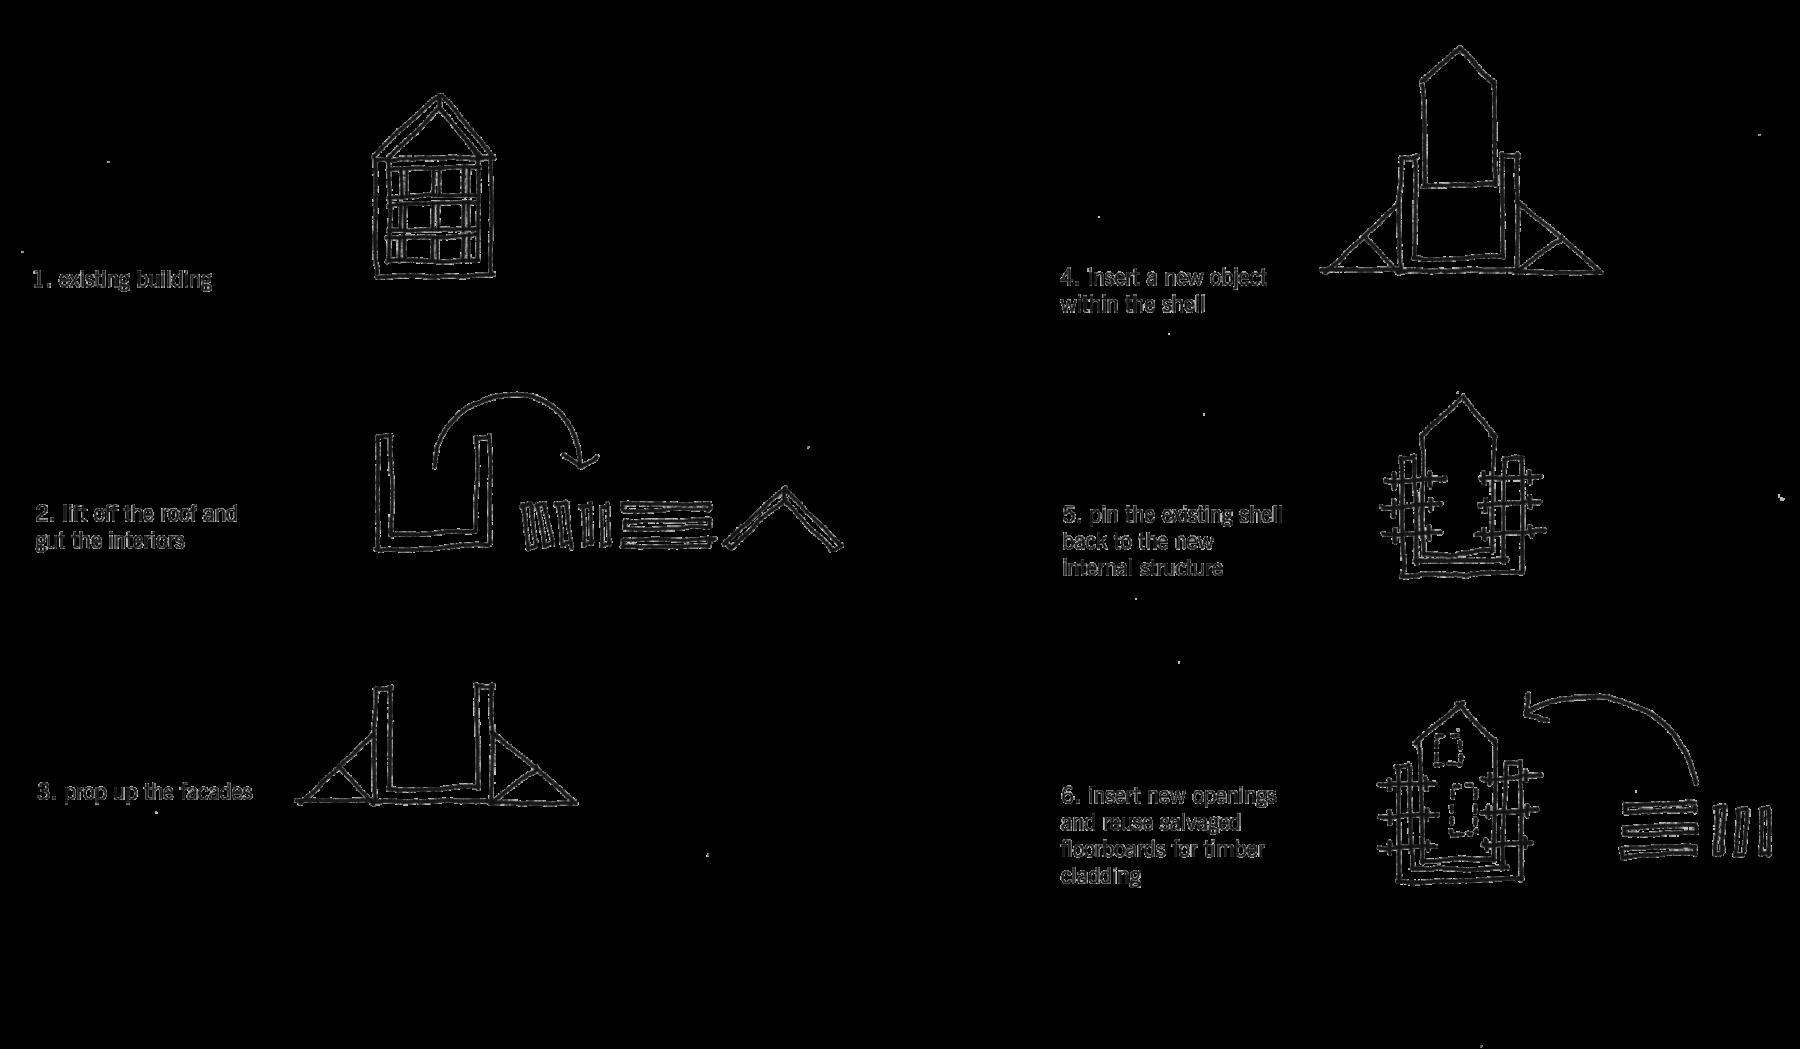 Sarah-Wigglesworth-Architects Swansea-Print-Works Diagram 3600